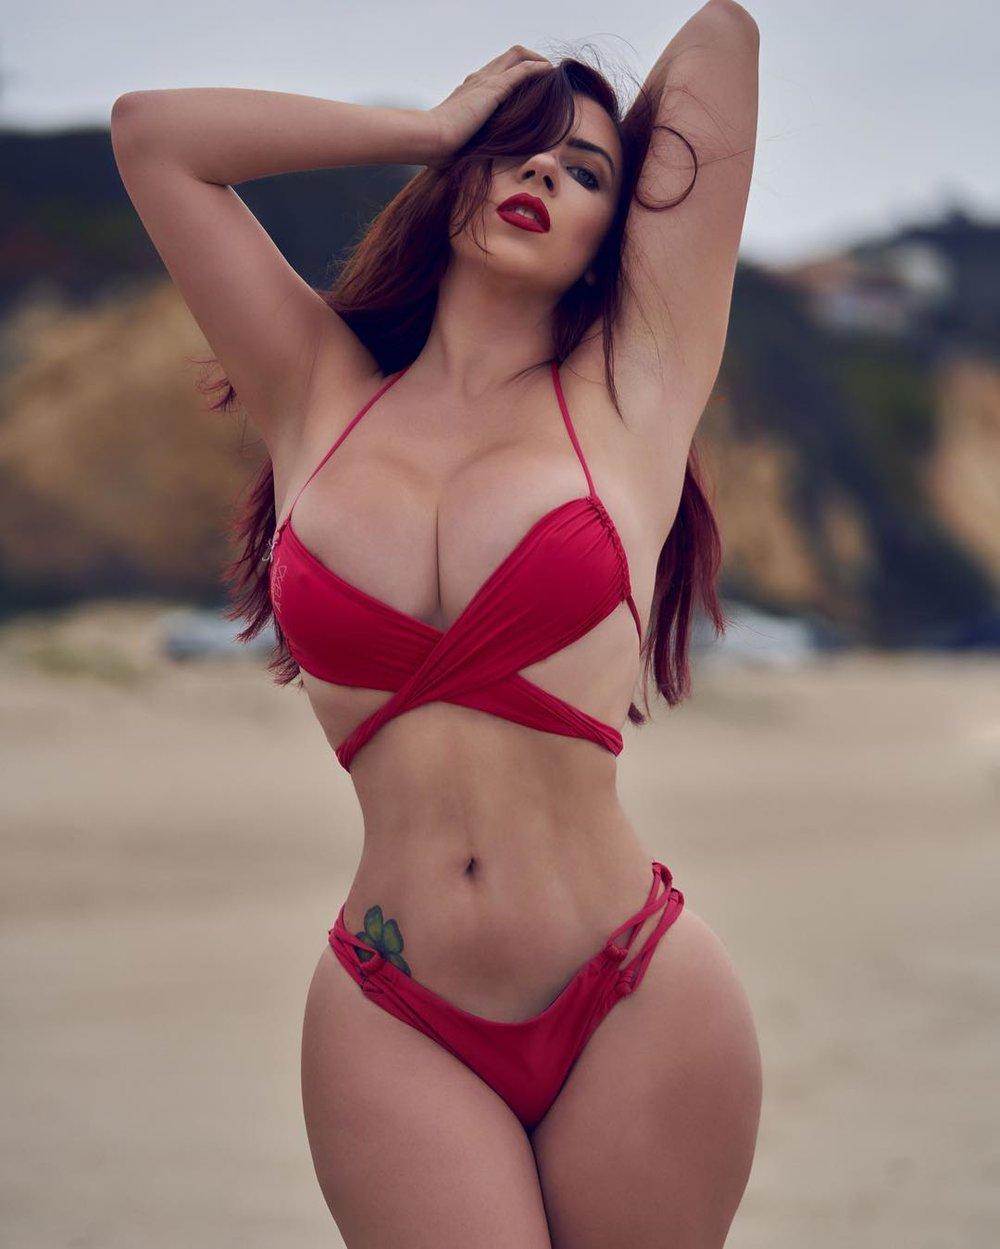 bikini_model_portrait_photography_30.jpg